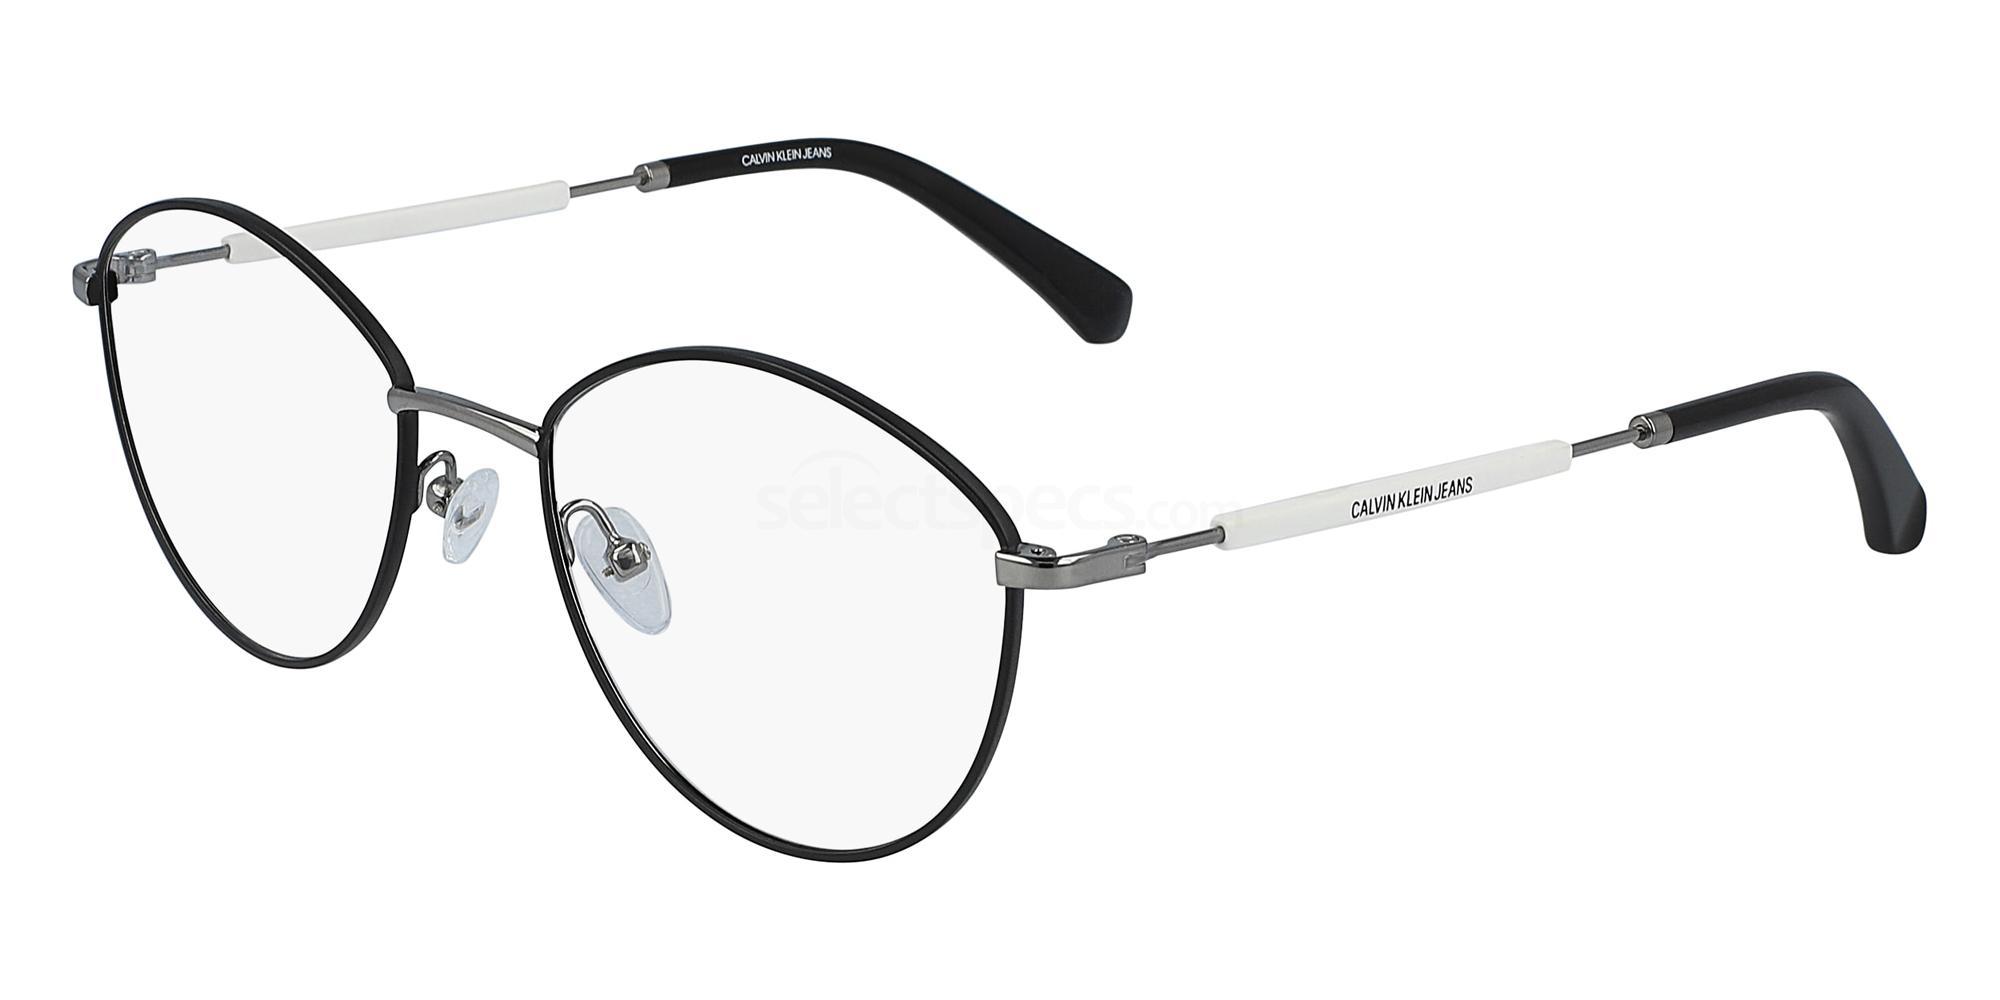 001 CKJ19107 Glasses, Calvin Klein Jeans